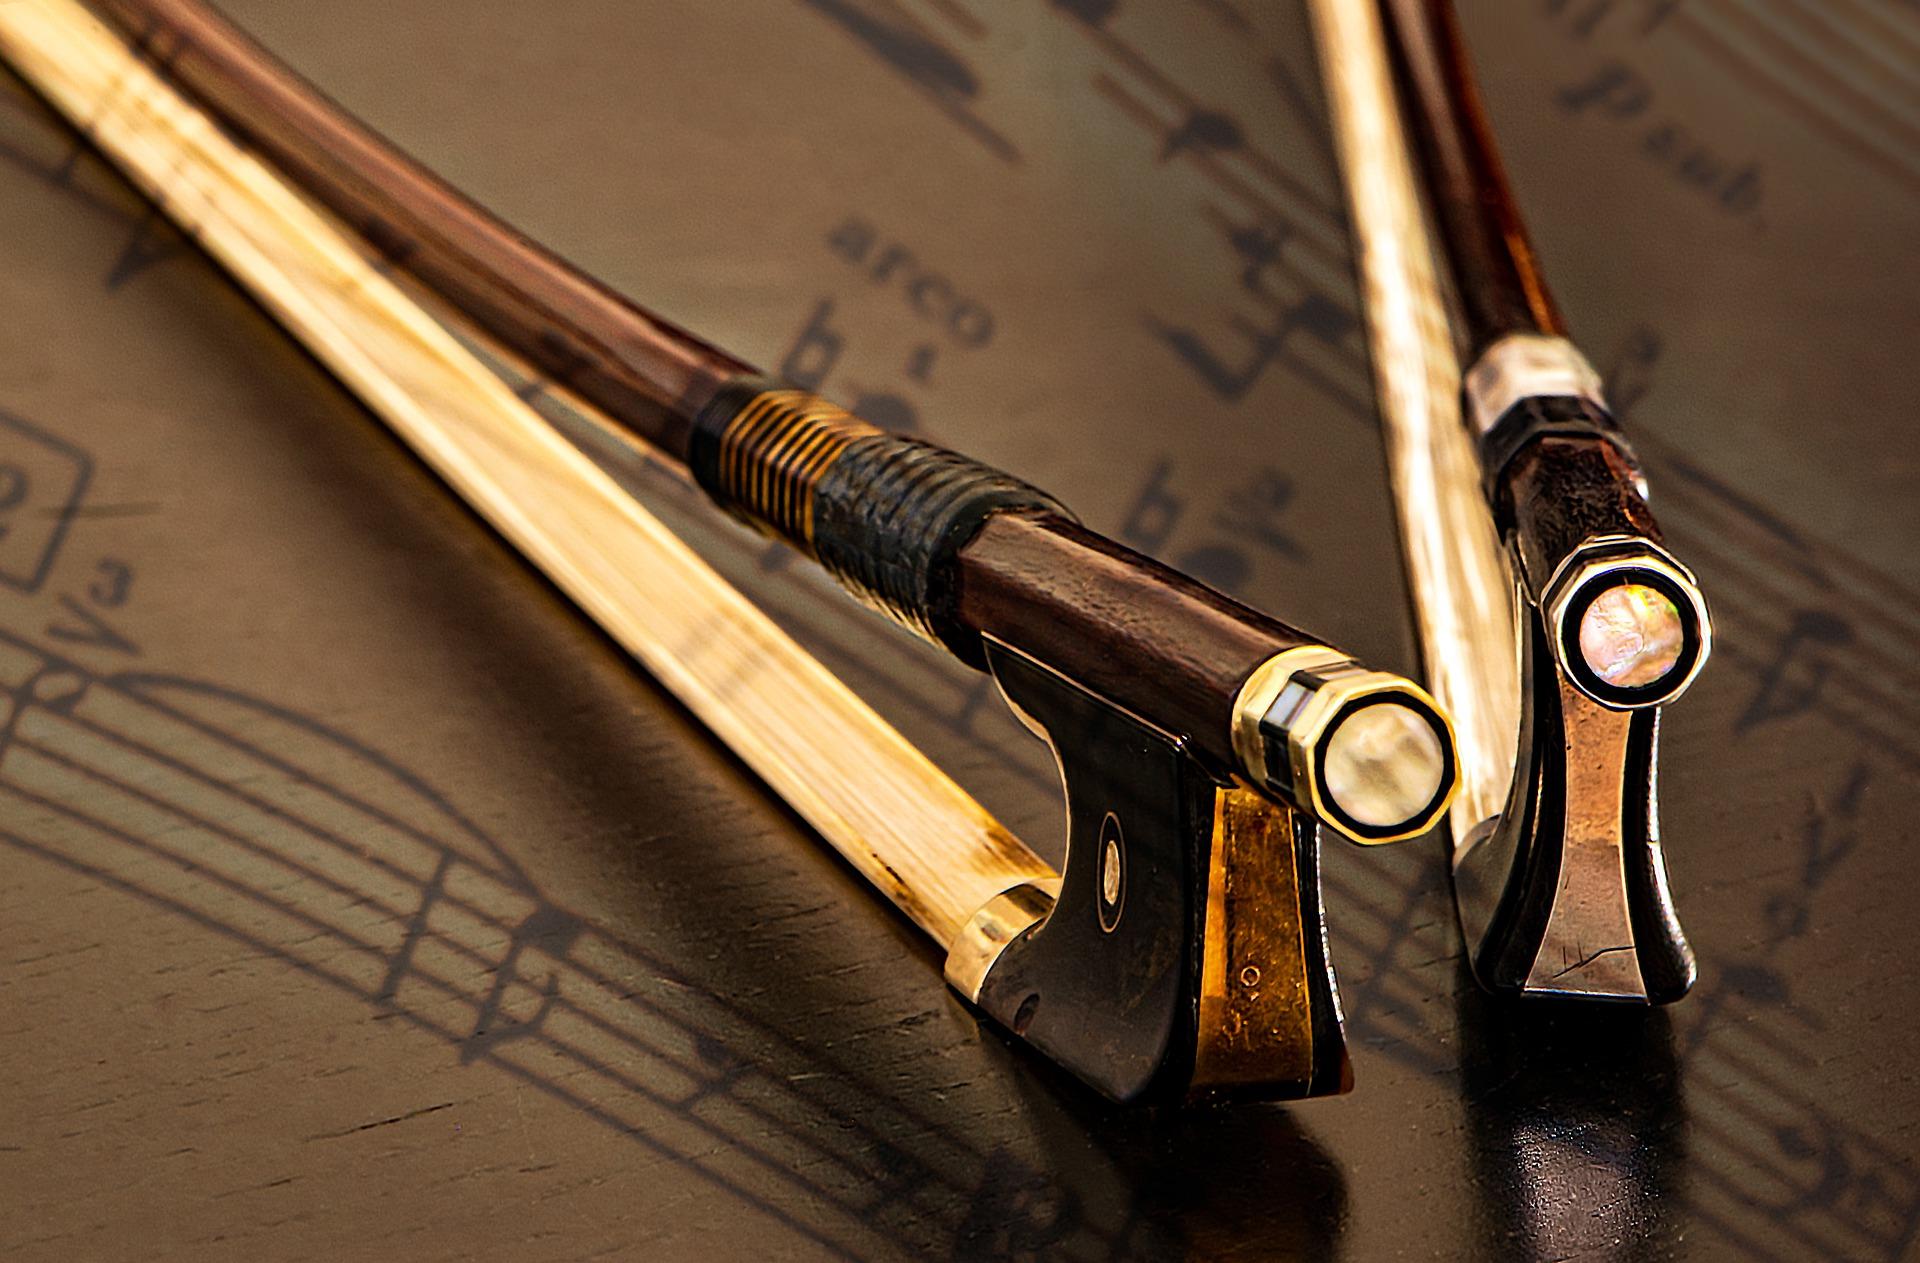 Джаз солнечных гор: онлайн-концерт организуют в «Царицыне»